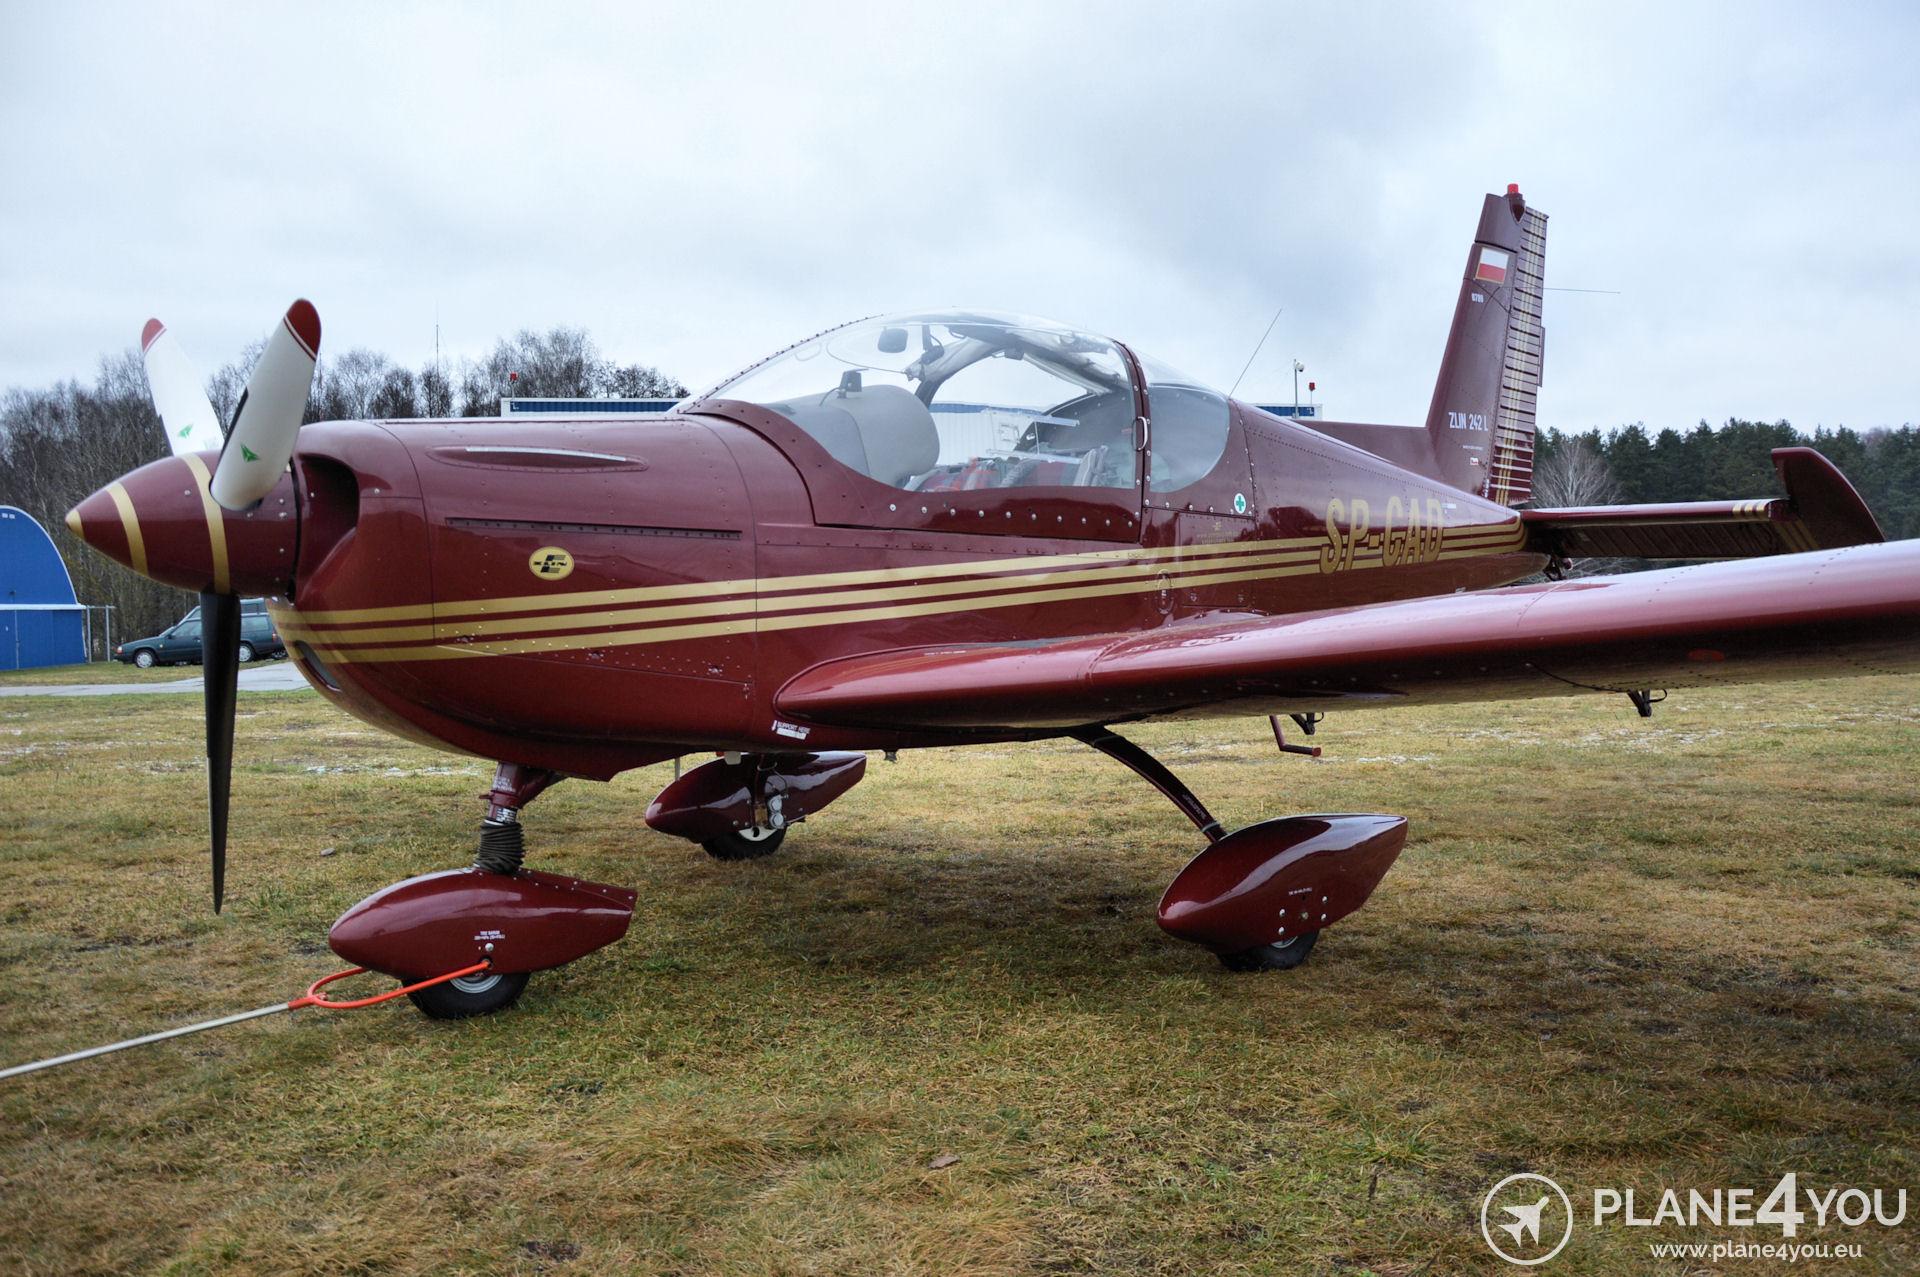 45  ZLIN Z-242L SP-CAD | Sold aircraft | Plane4You Aircraft Sales Center